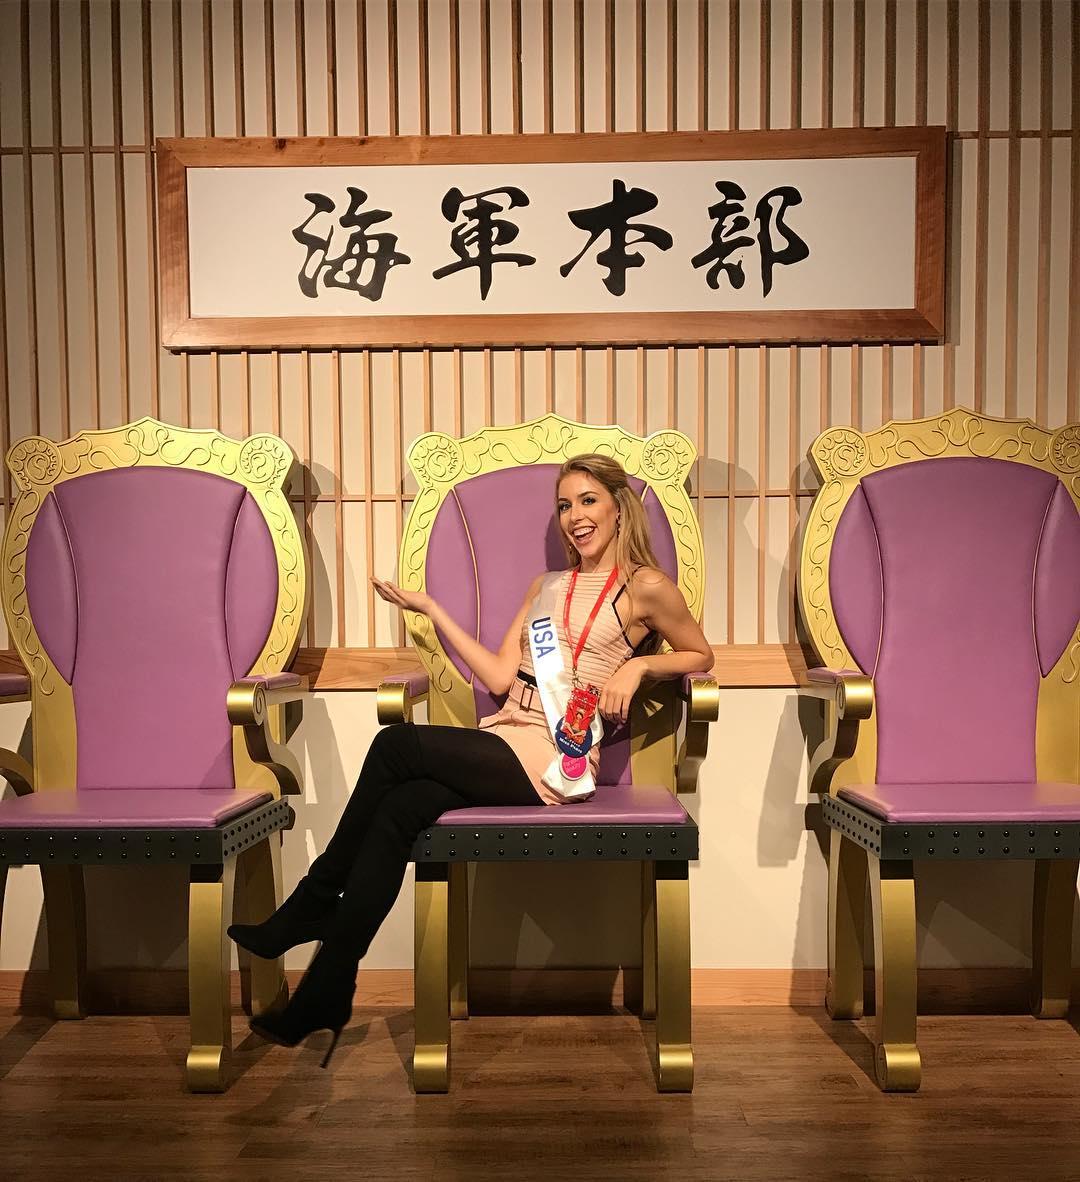 kaitryana leinbach, top 5 de miss international 2016. - Página 4 Nhgdfxcf